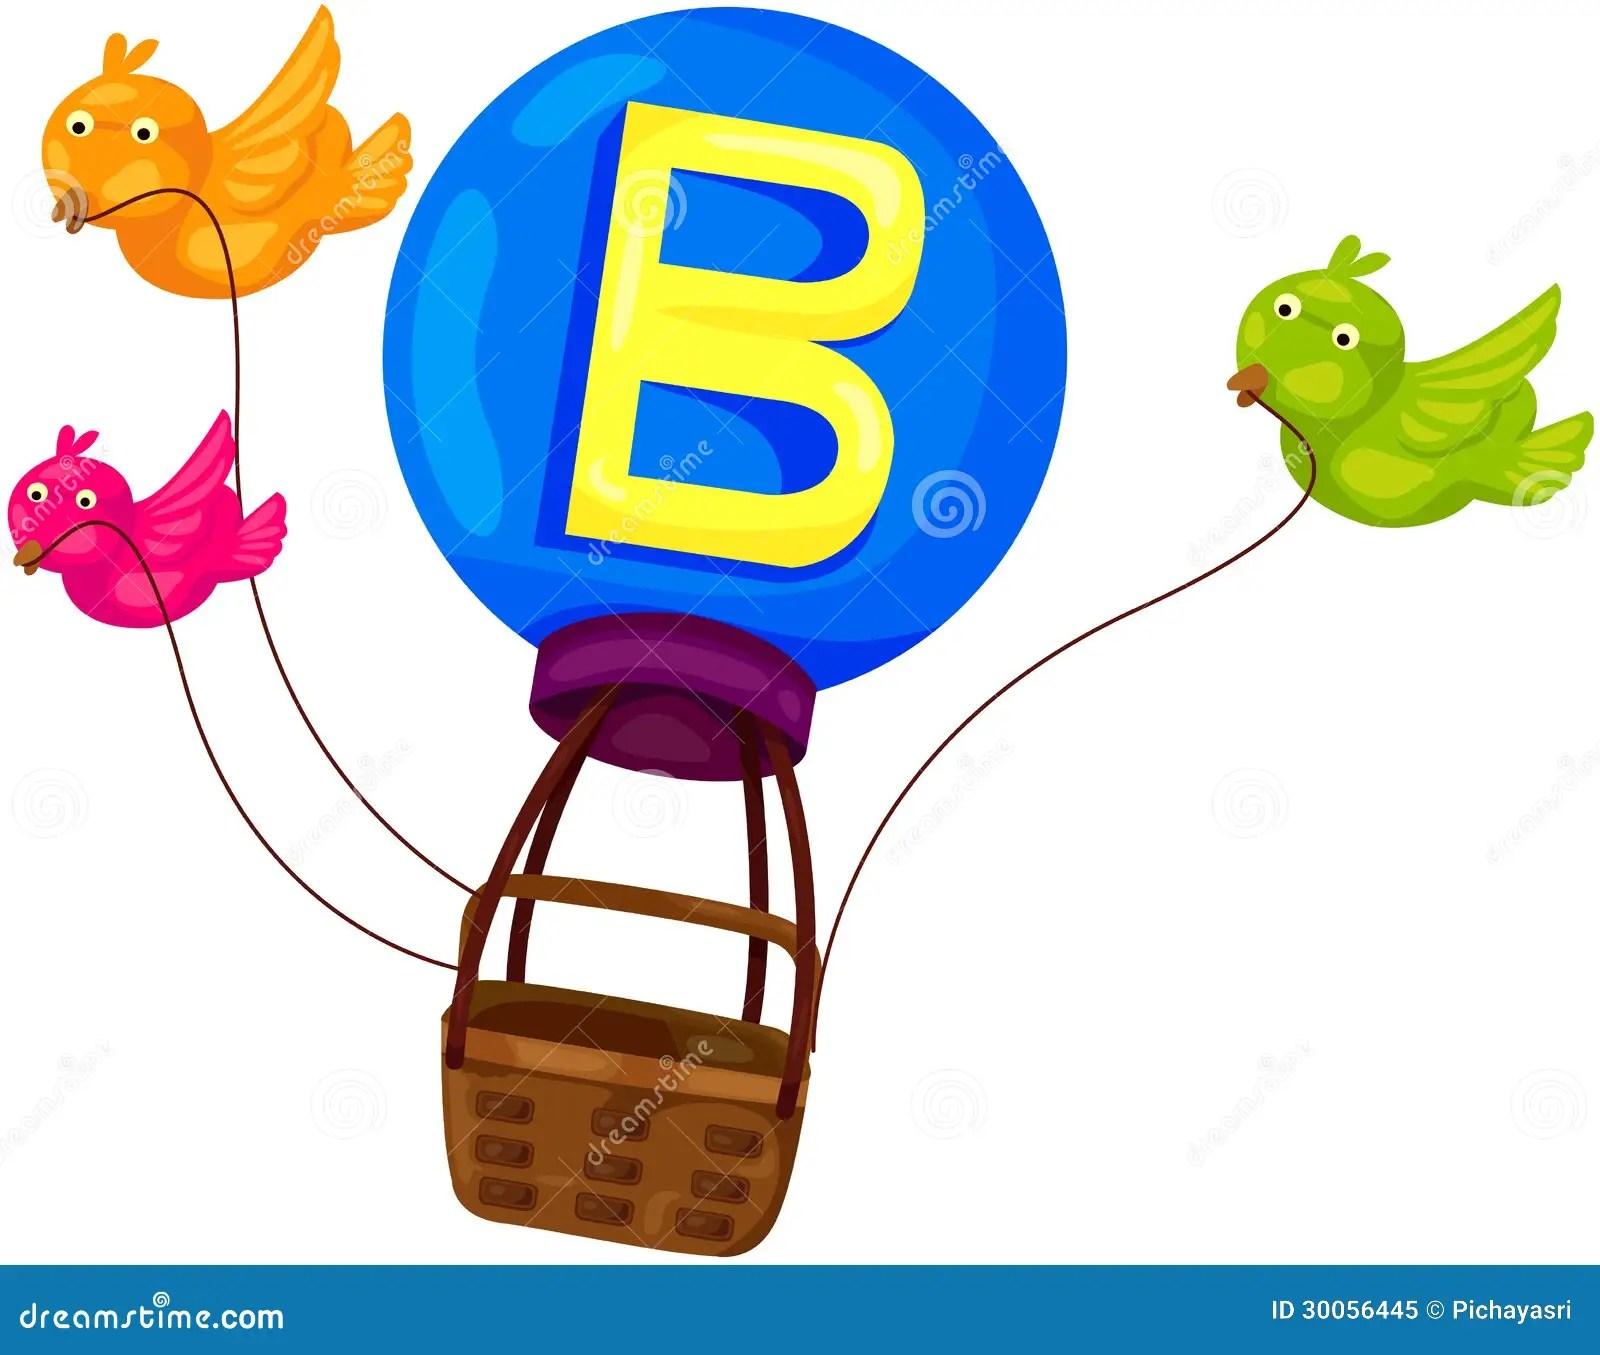 Alphabet B For Bird Stock Vector Illustration Of Child